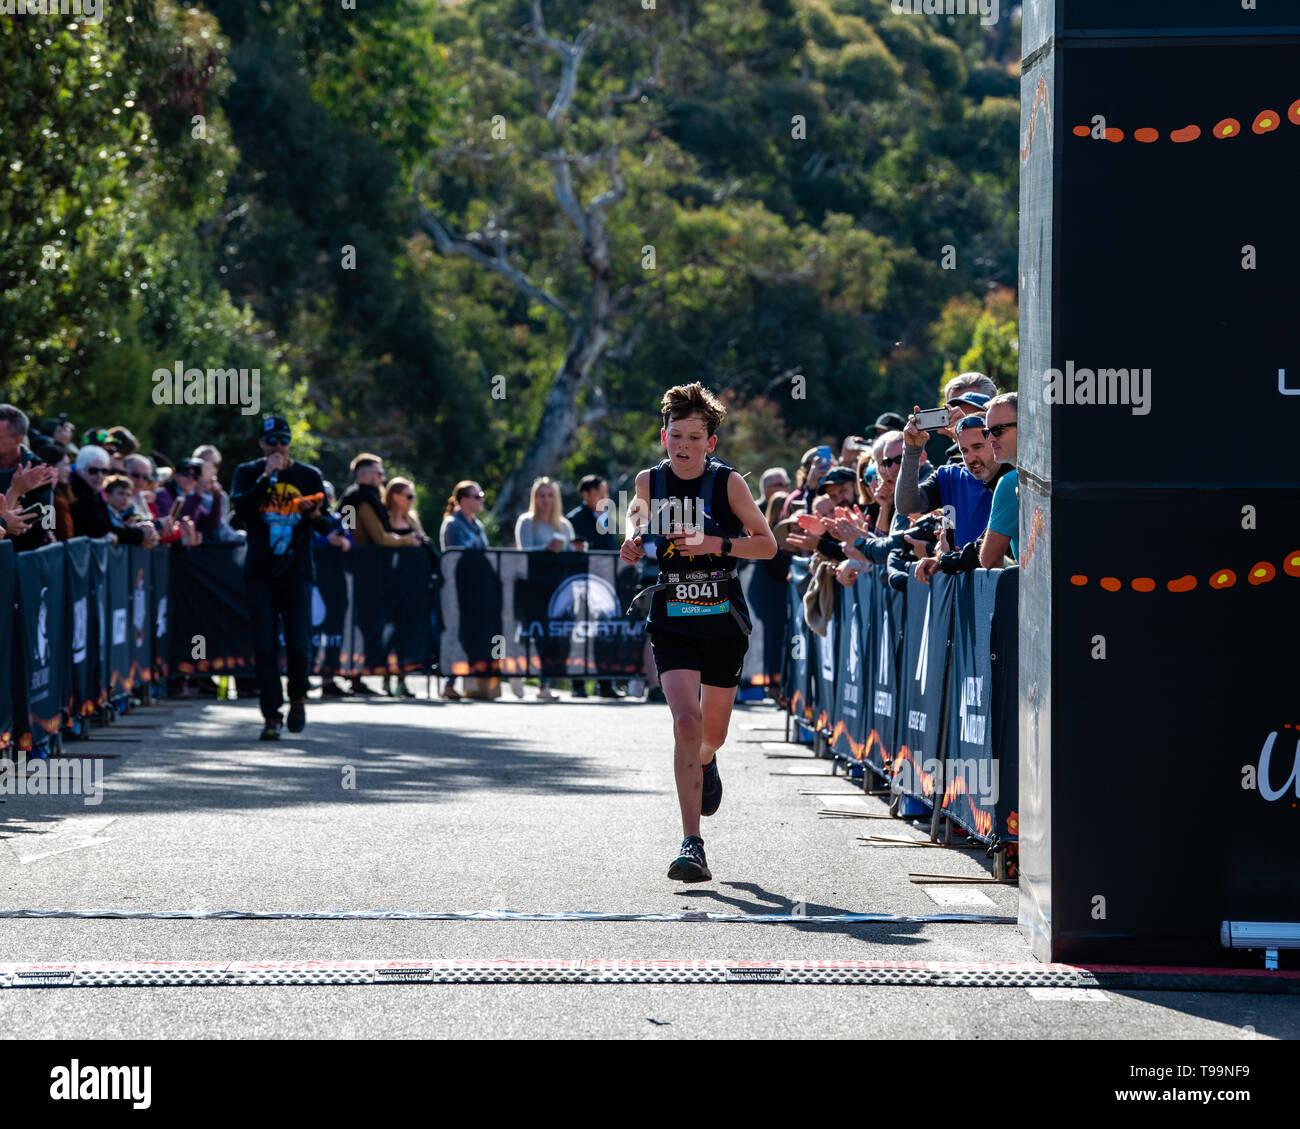 Blue Mountains, Australia - April 16 2019: Ultra-Trail Australia UTA11 race. Runner Capser Larkin closes in at the finish line. - Stock Image